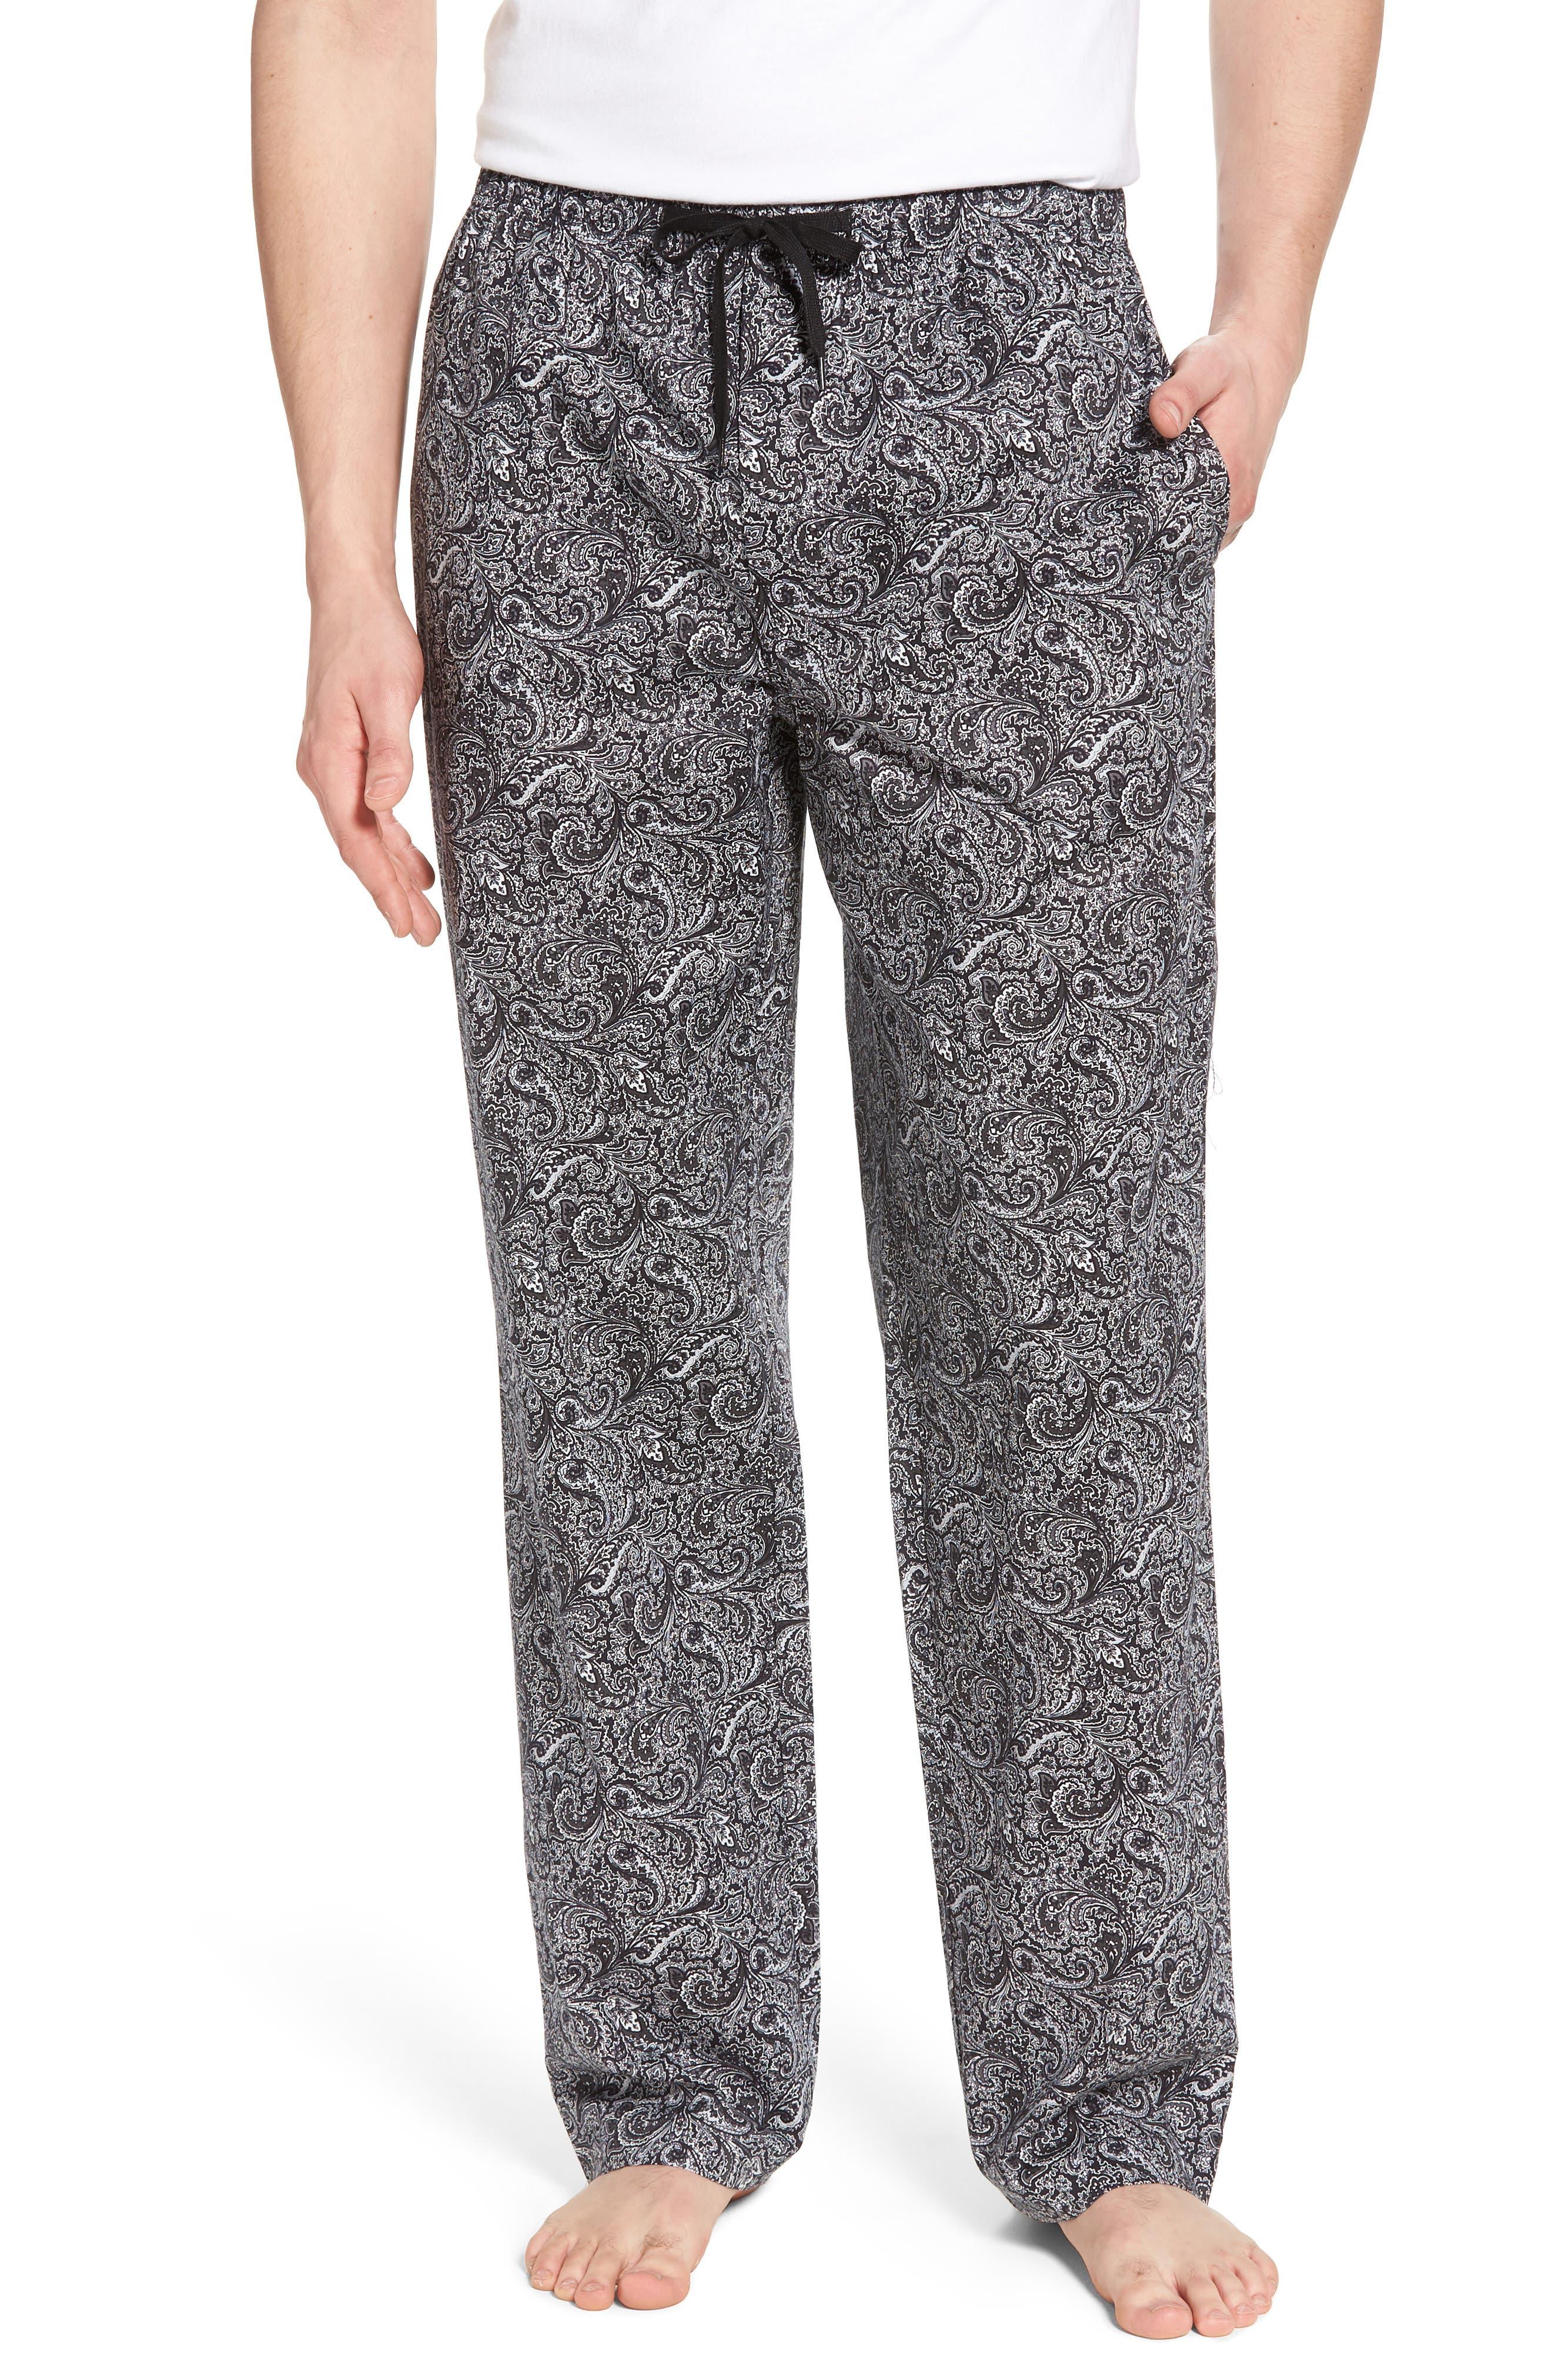 Starling Lounge Pants,                         Main,                         color, BLACK PAISLEY